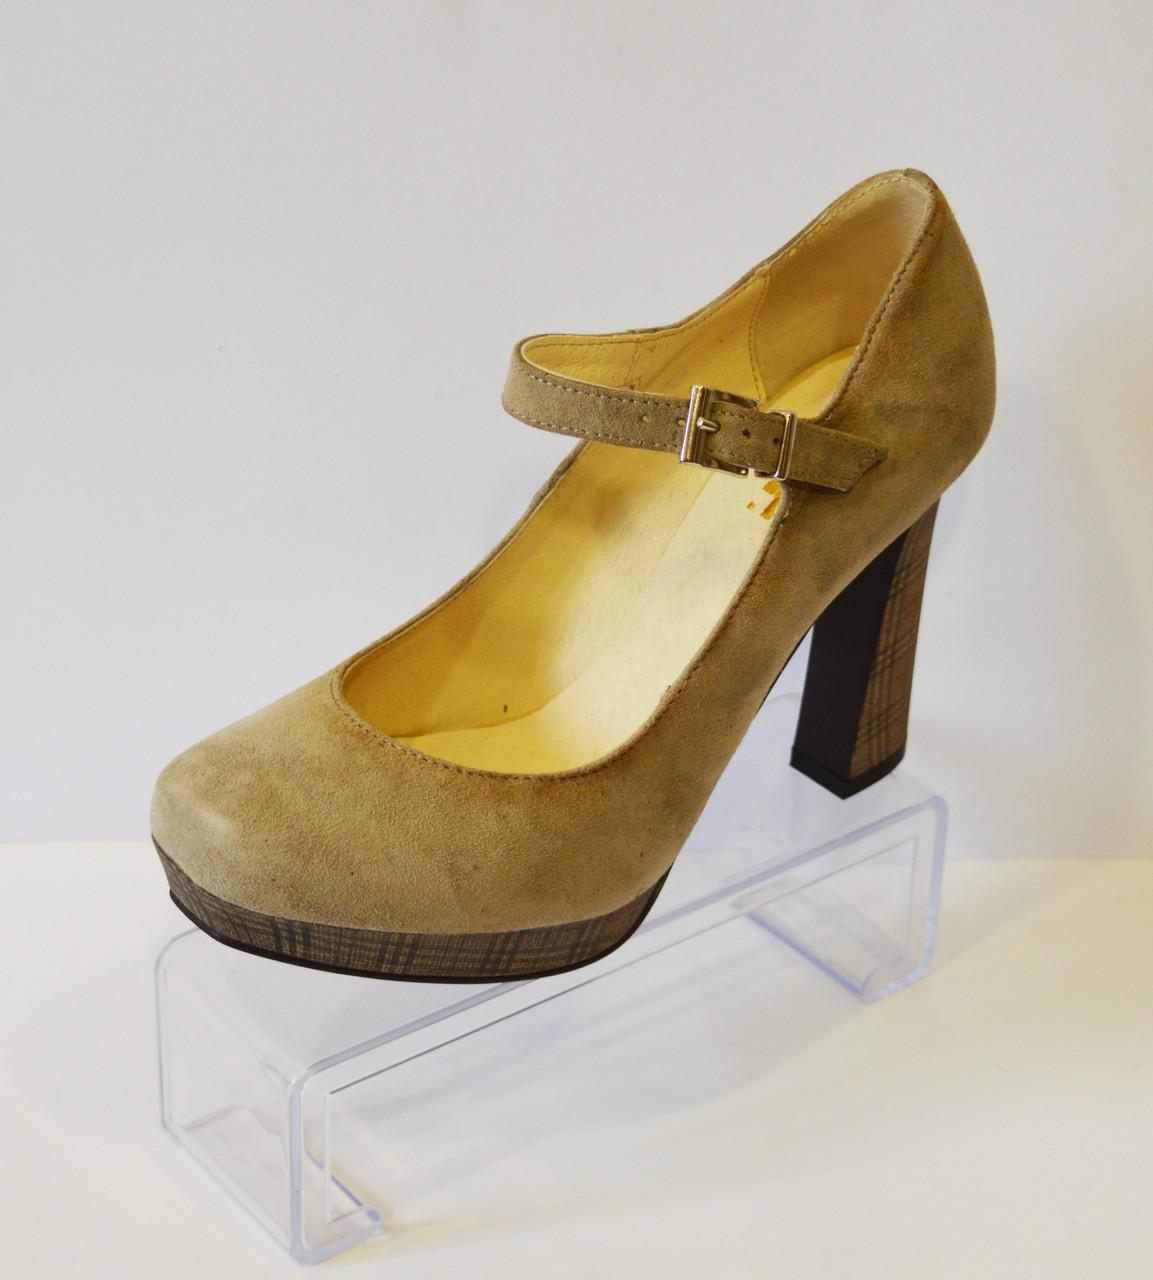 Бежевые женские туфли A.J.F. 513